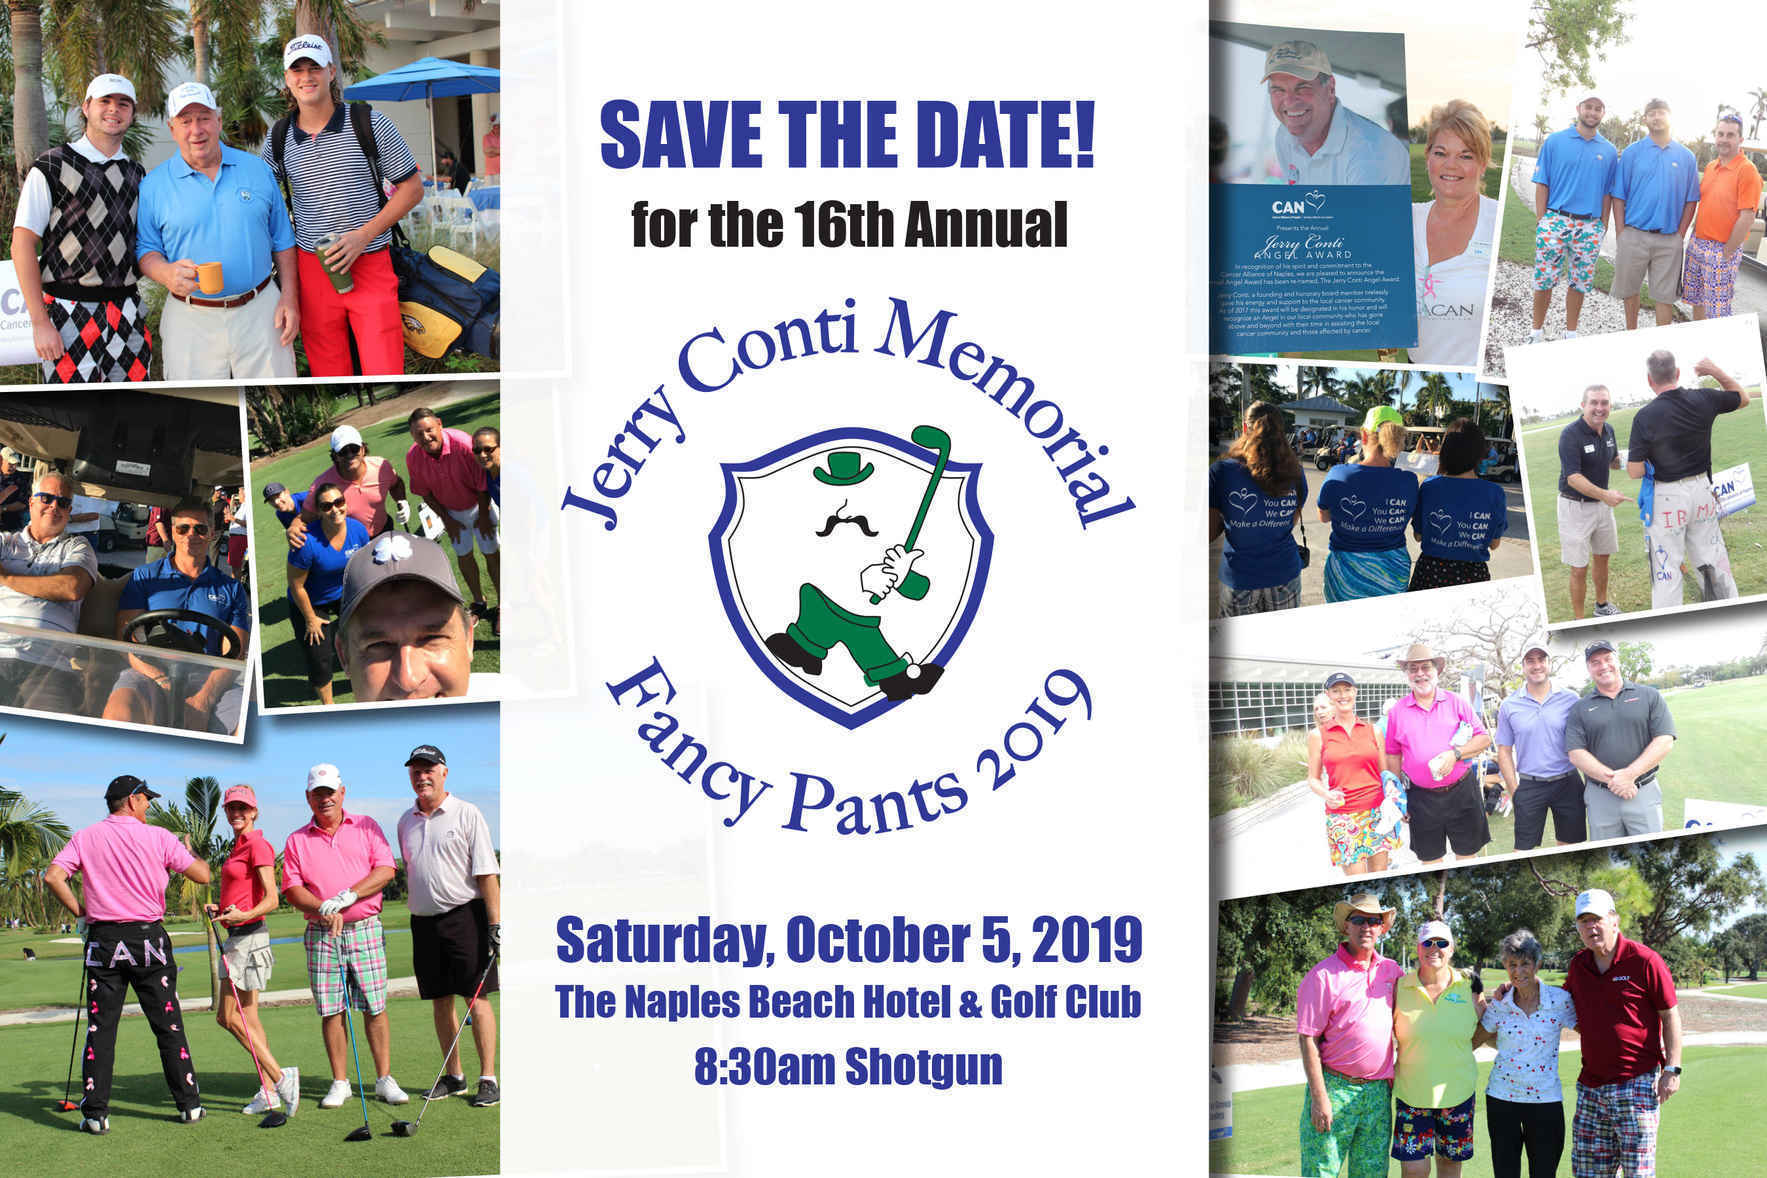 2019 Jerry Conti Memorial Fancy Pants Golf Tournament image